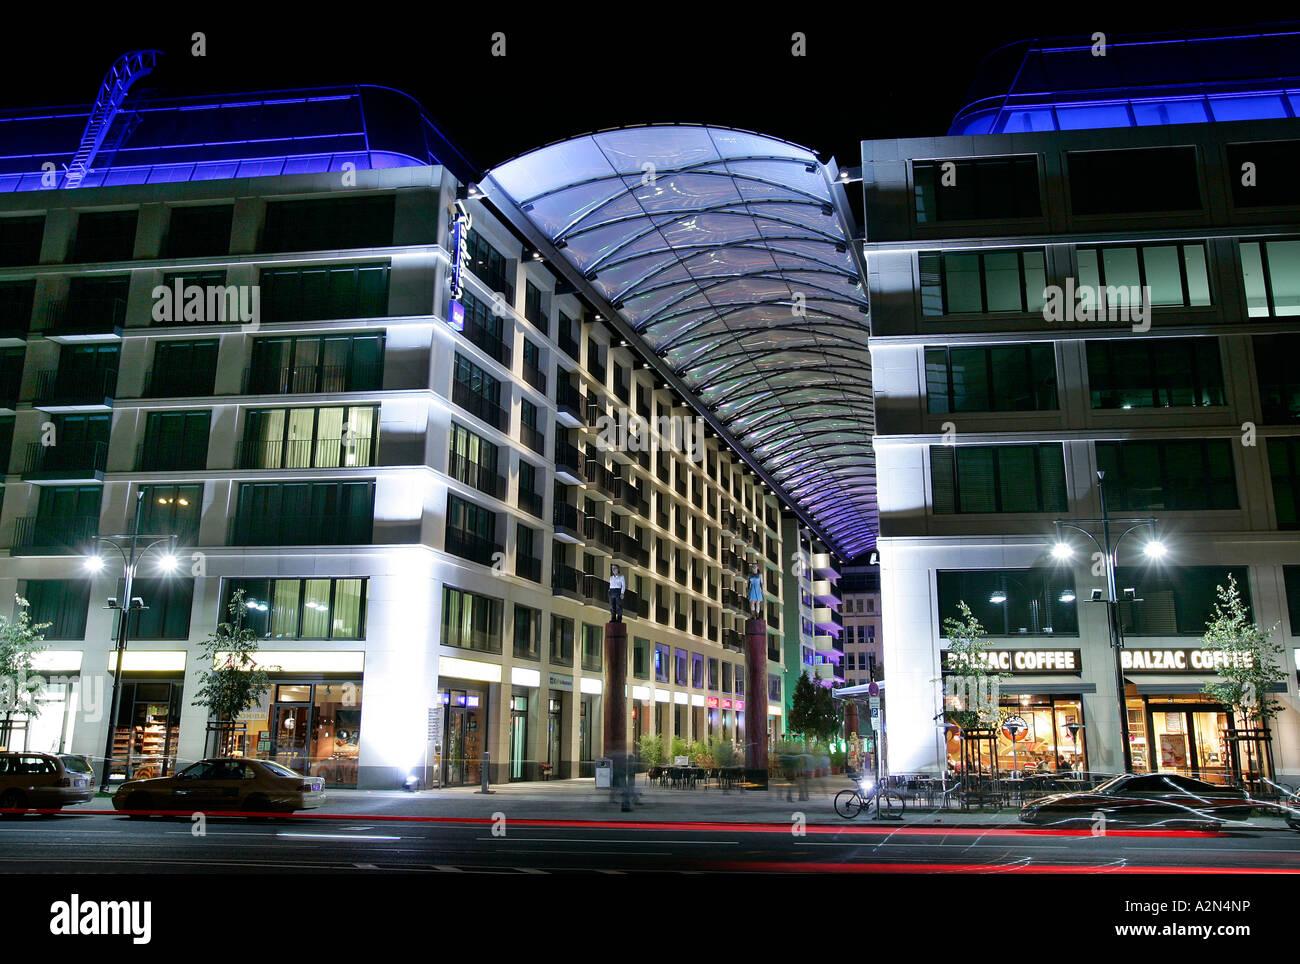 Hotel illuminated at night, Radisson Blu, Berlin, Germany - Stock Image